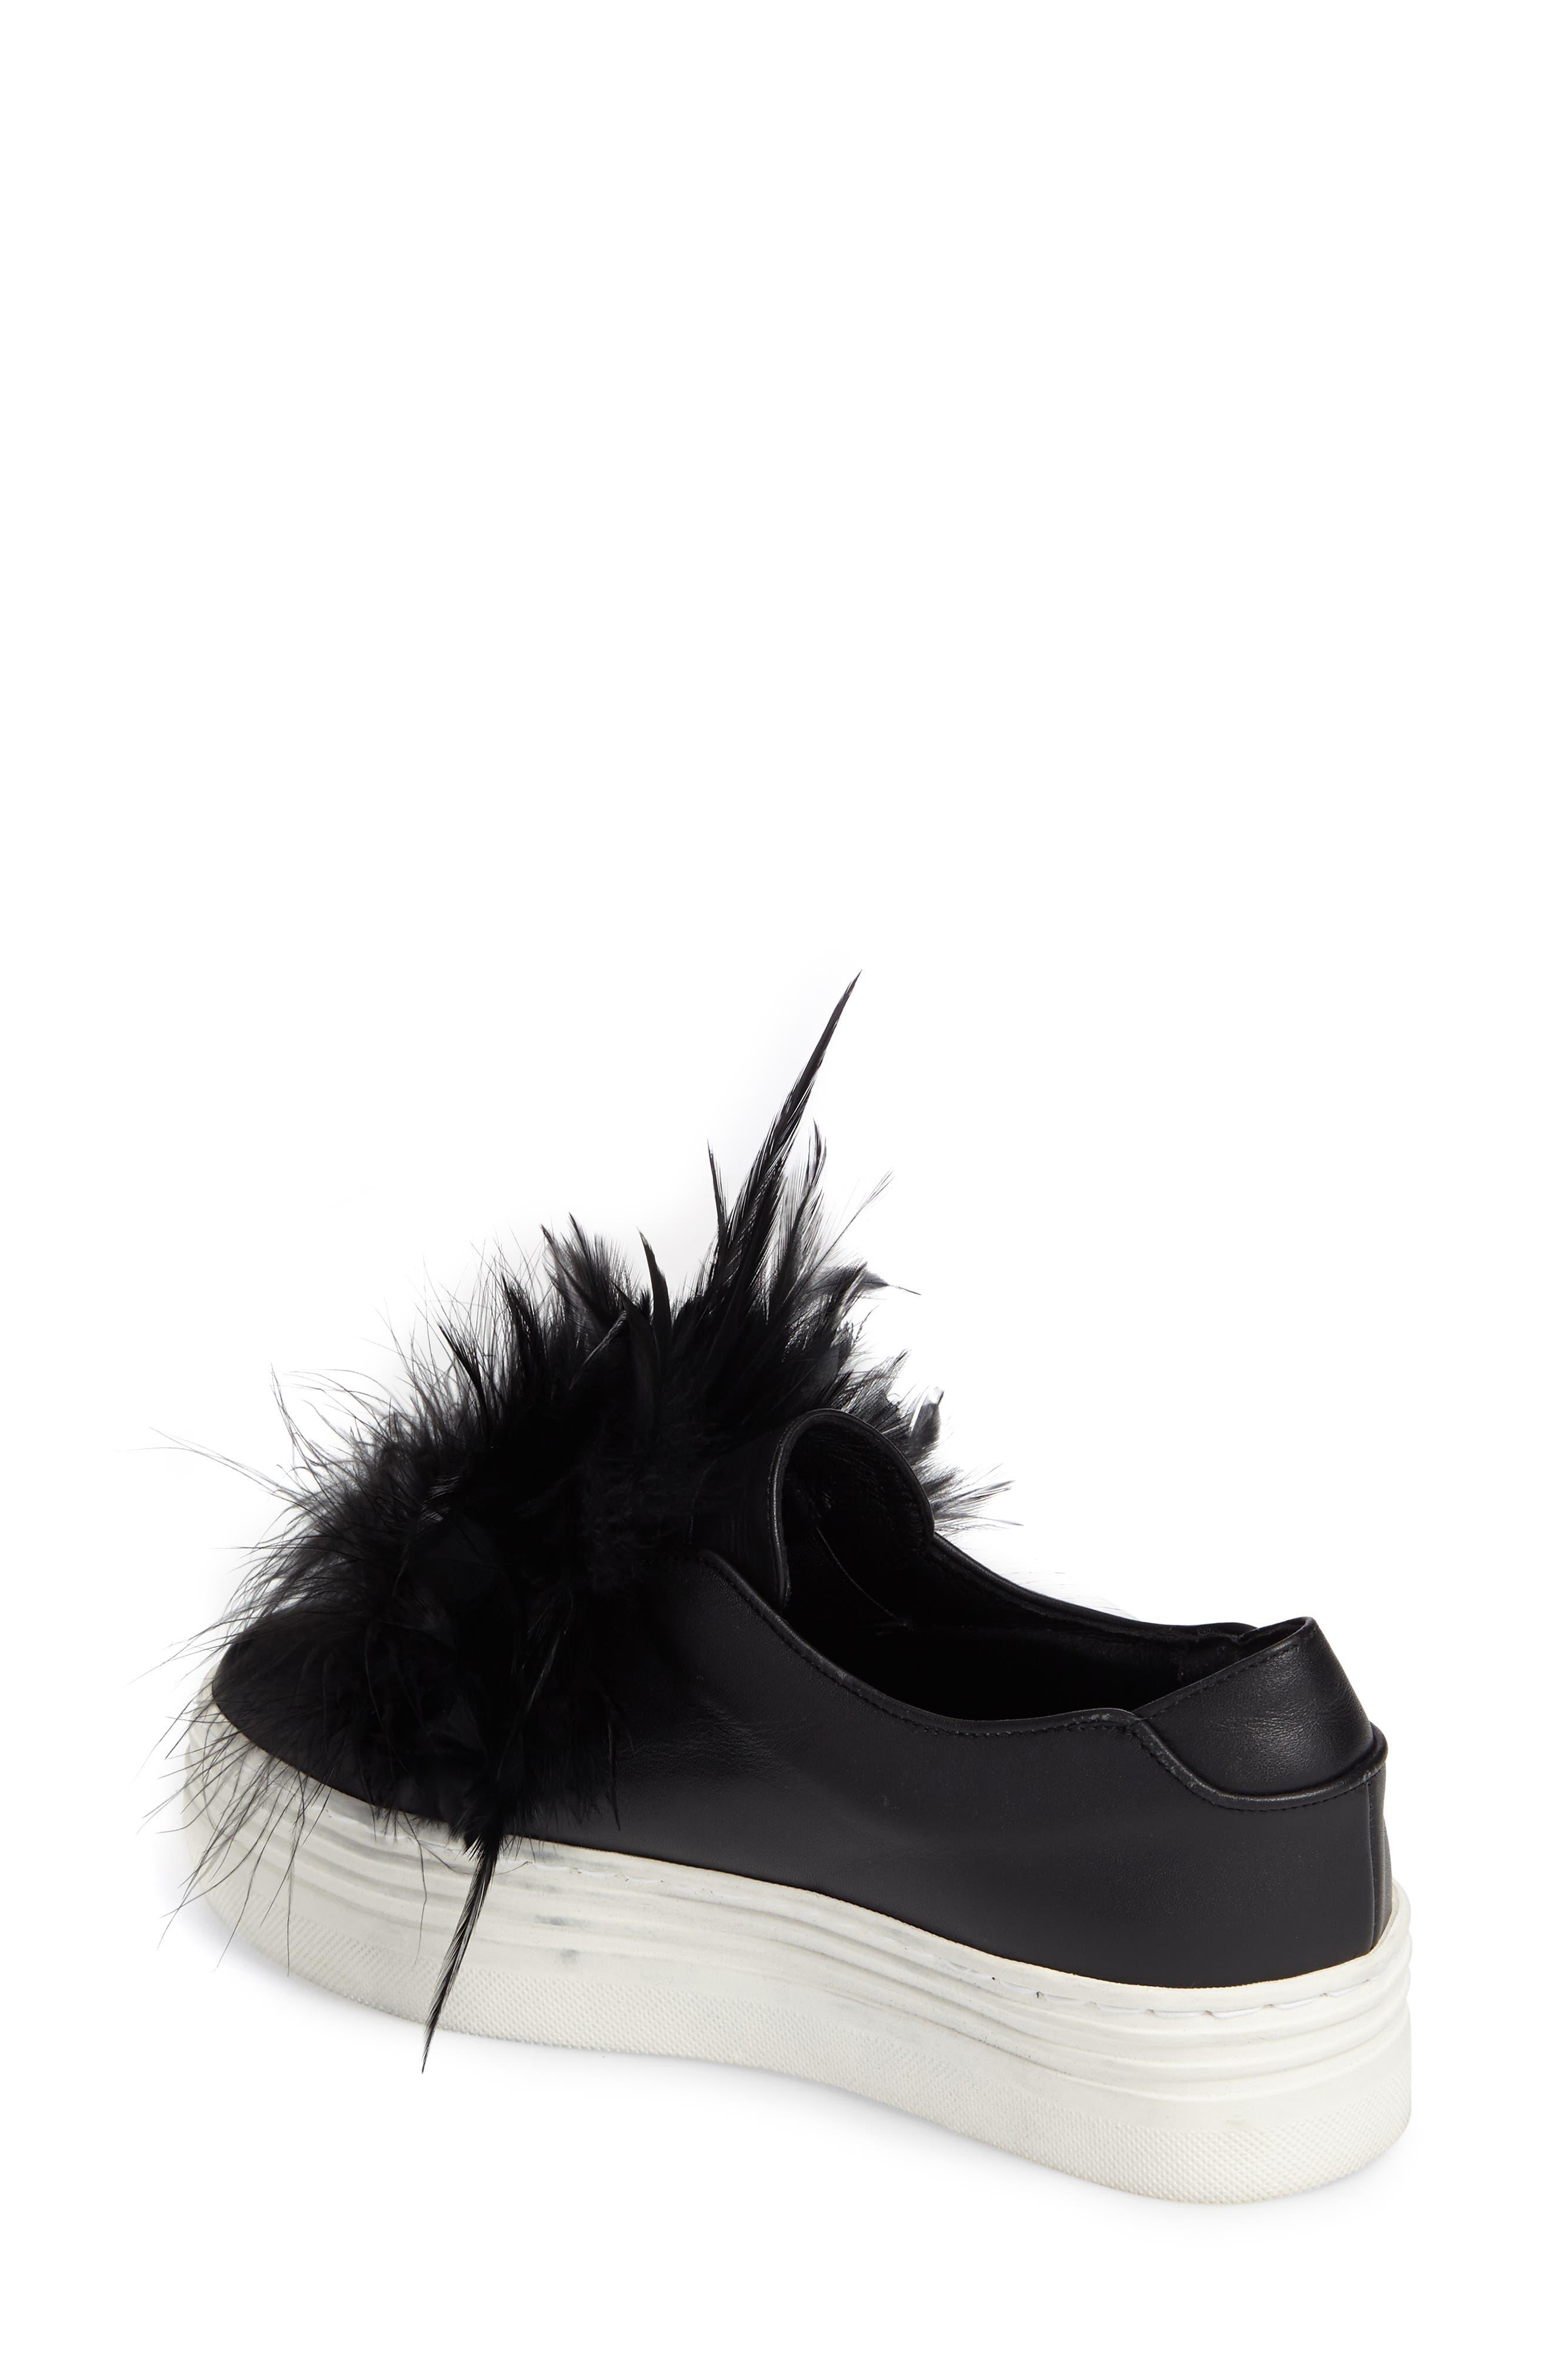 Lily Feather Pom Slip-On Platform Sneaker,                             Alternate thumbnail 2, color,                             001